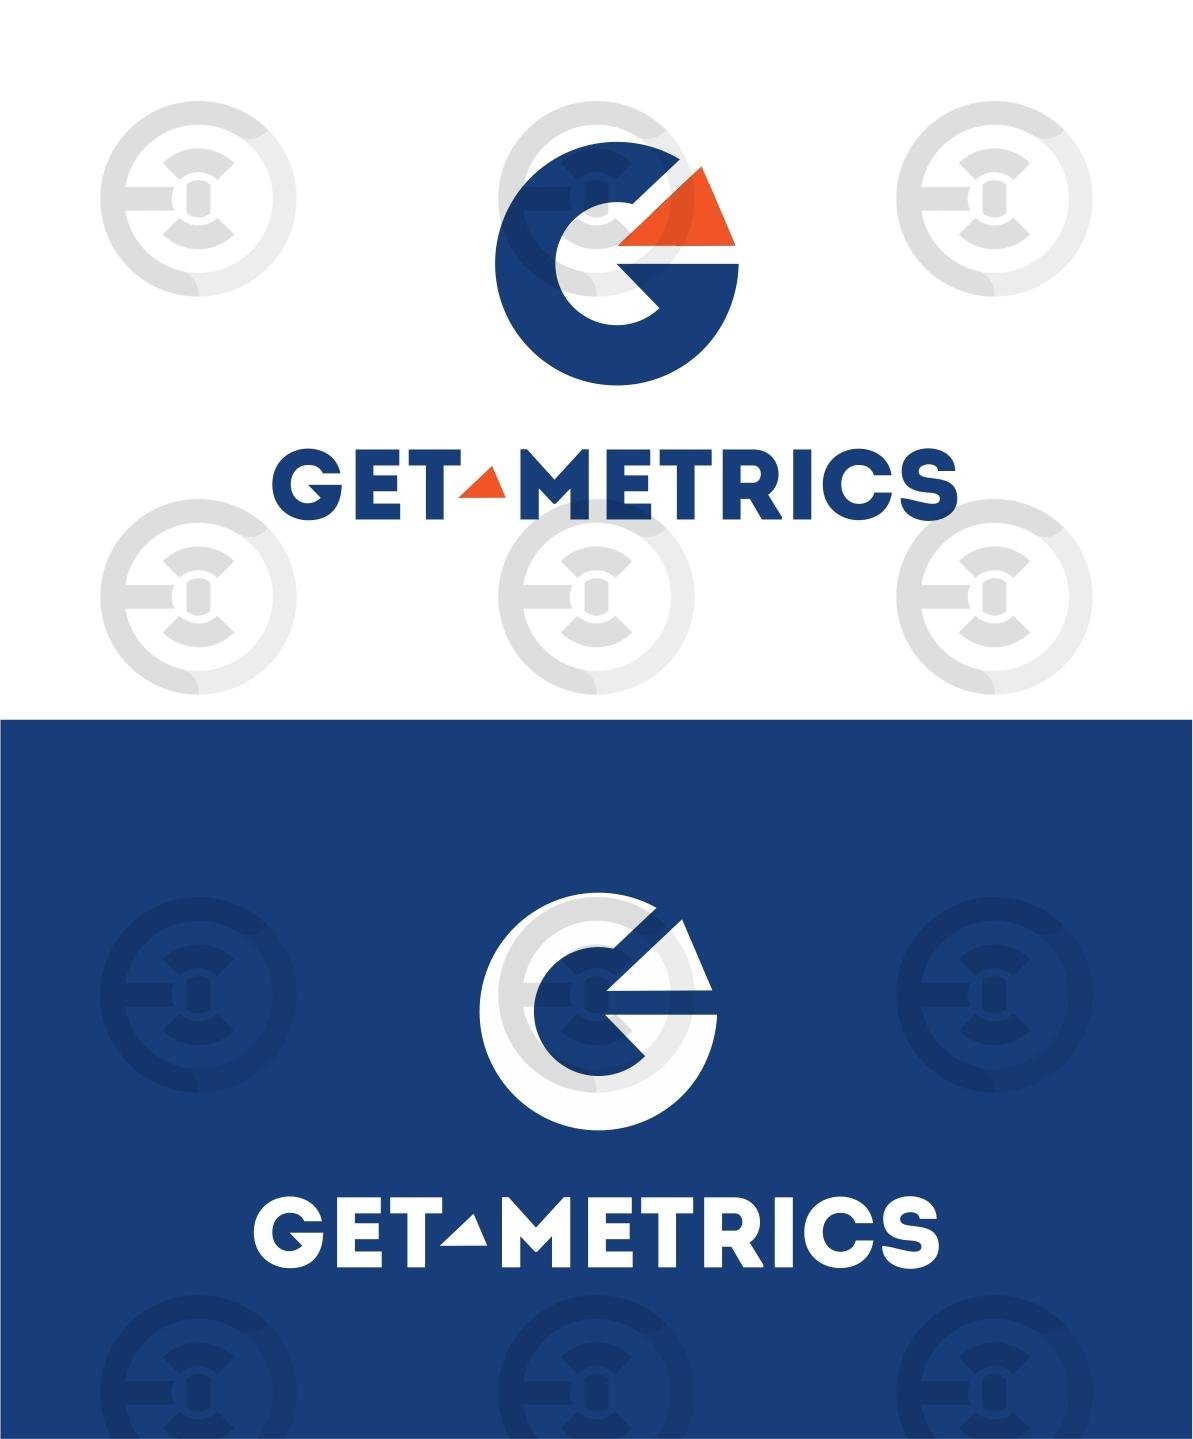 Get-metrics2.jpg